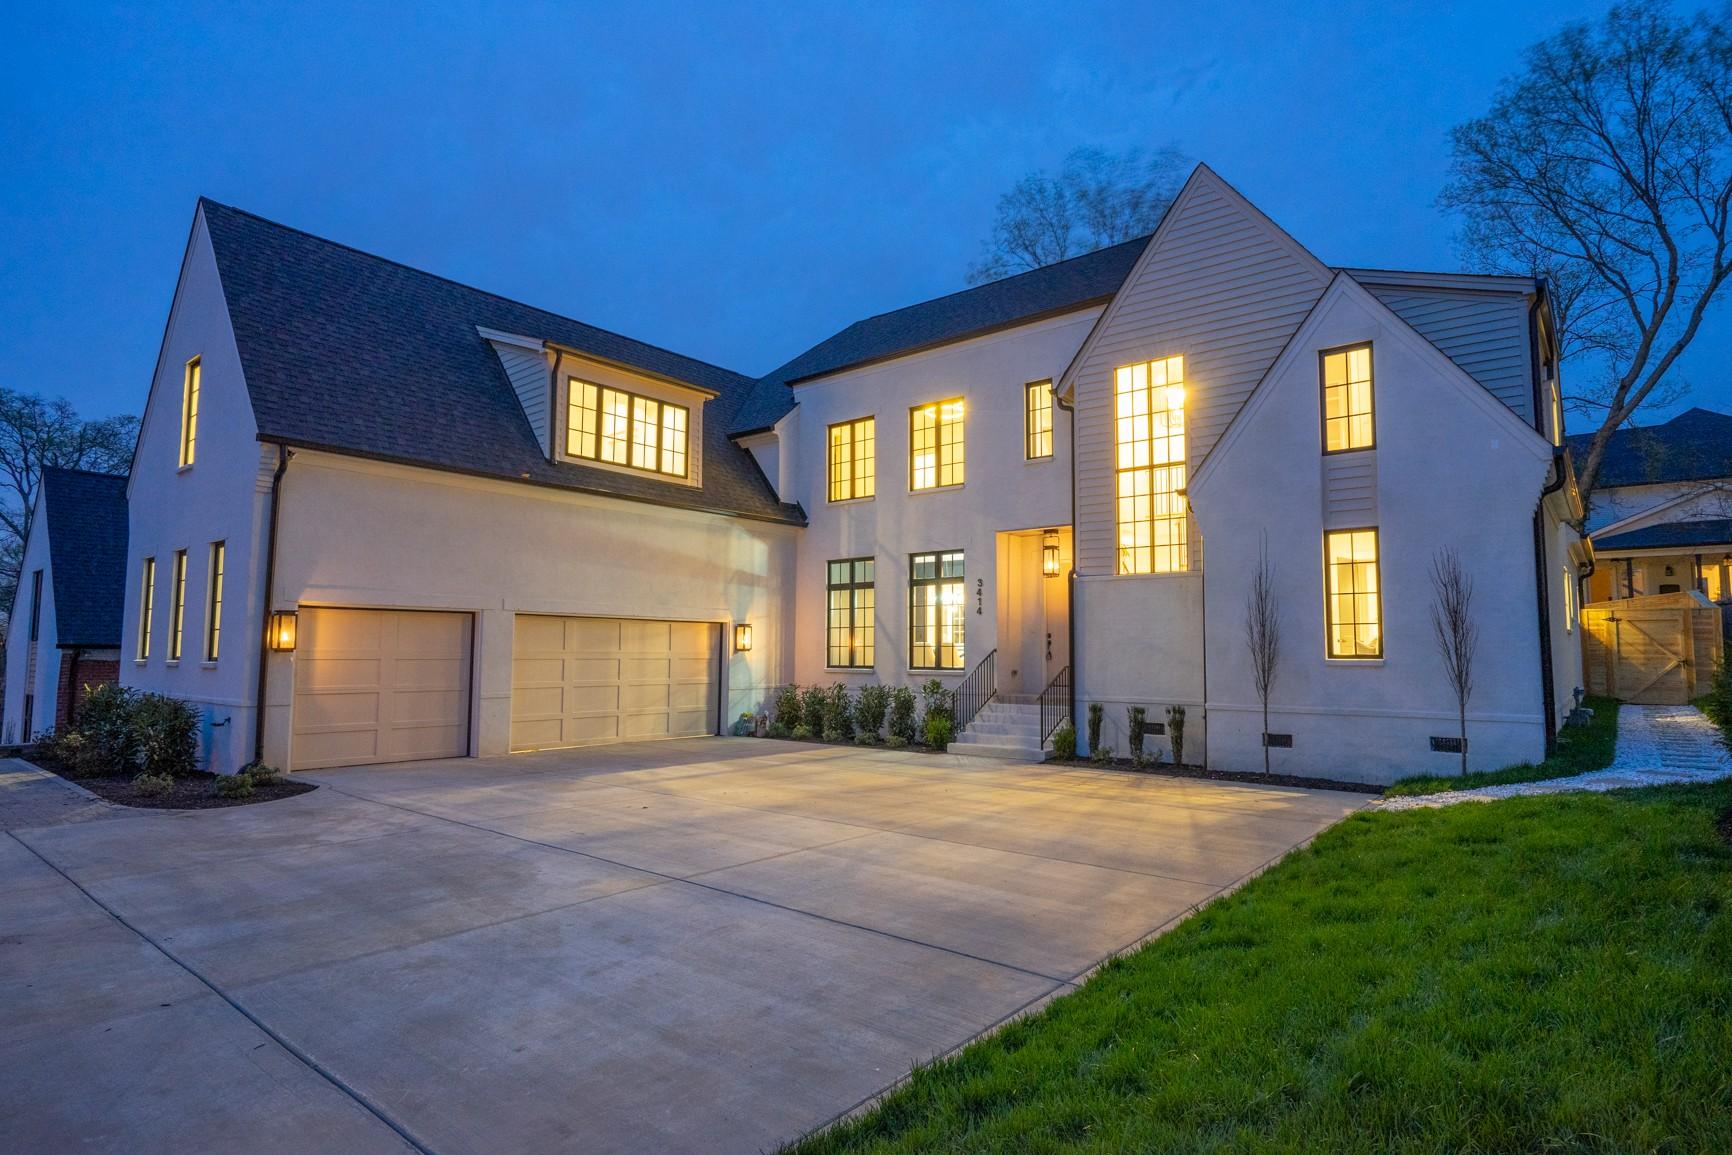 3414 Golf Club Ln, Nashville, TN 37215 - Nashville, TN real estate listing